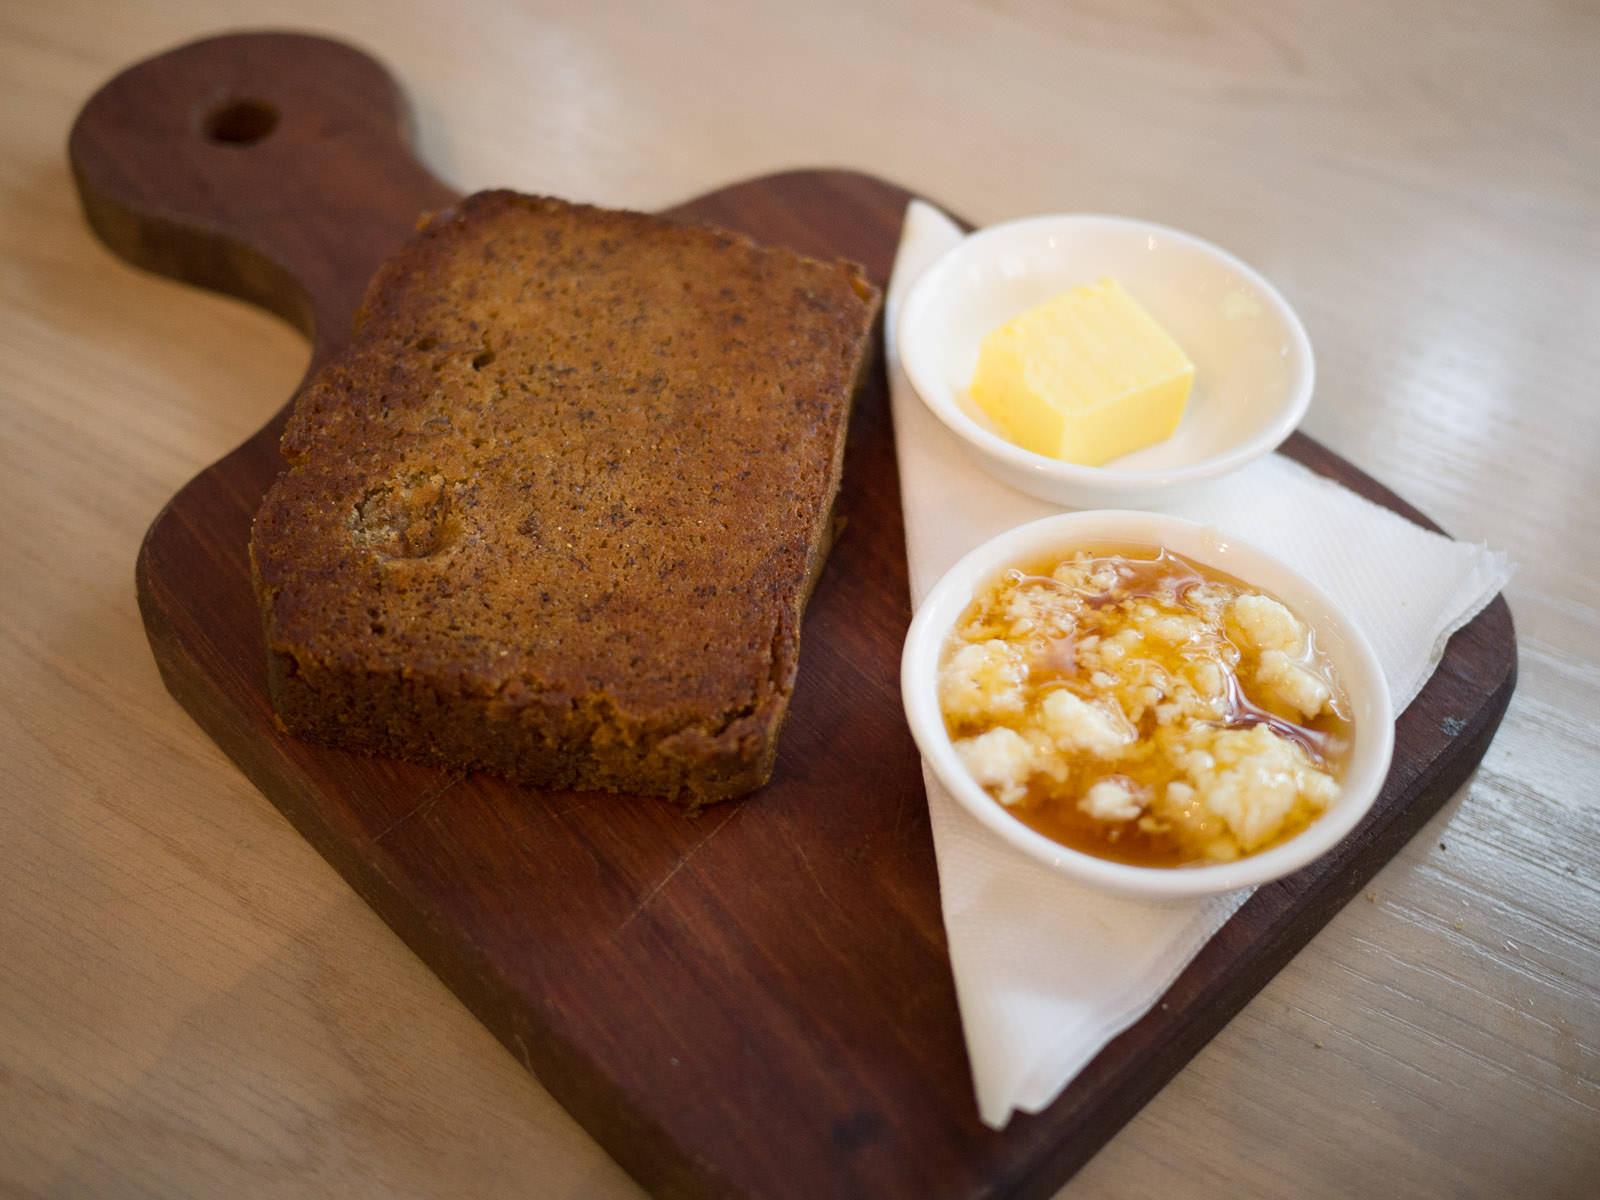 Banana bread (AU$7.50) with honey and ricotta